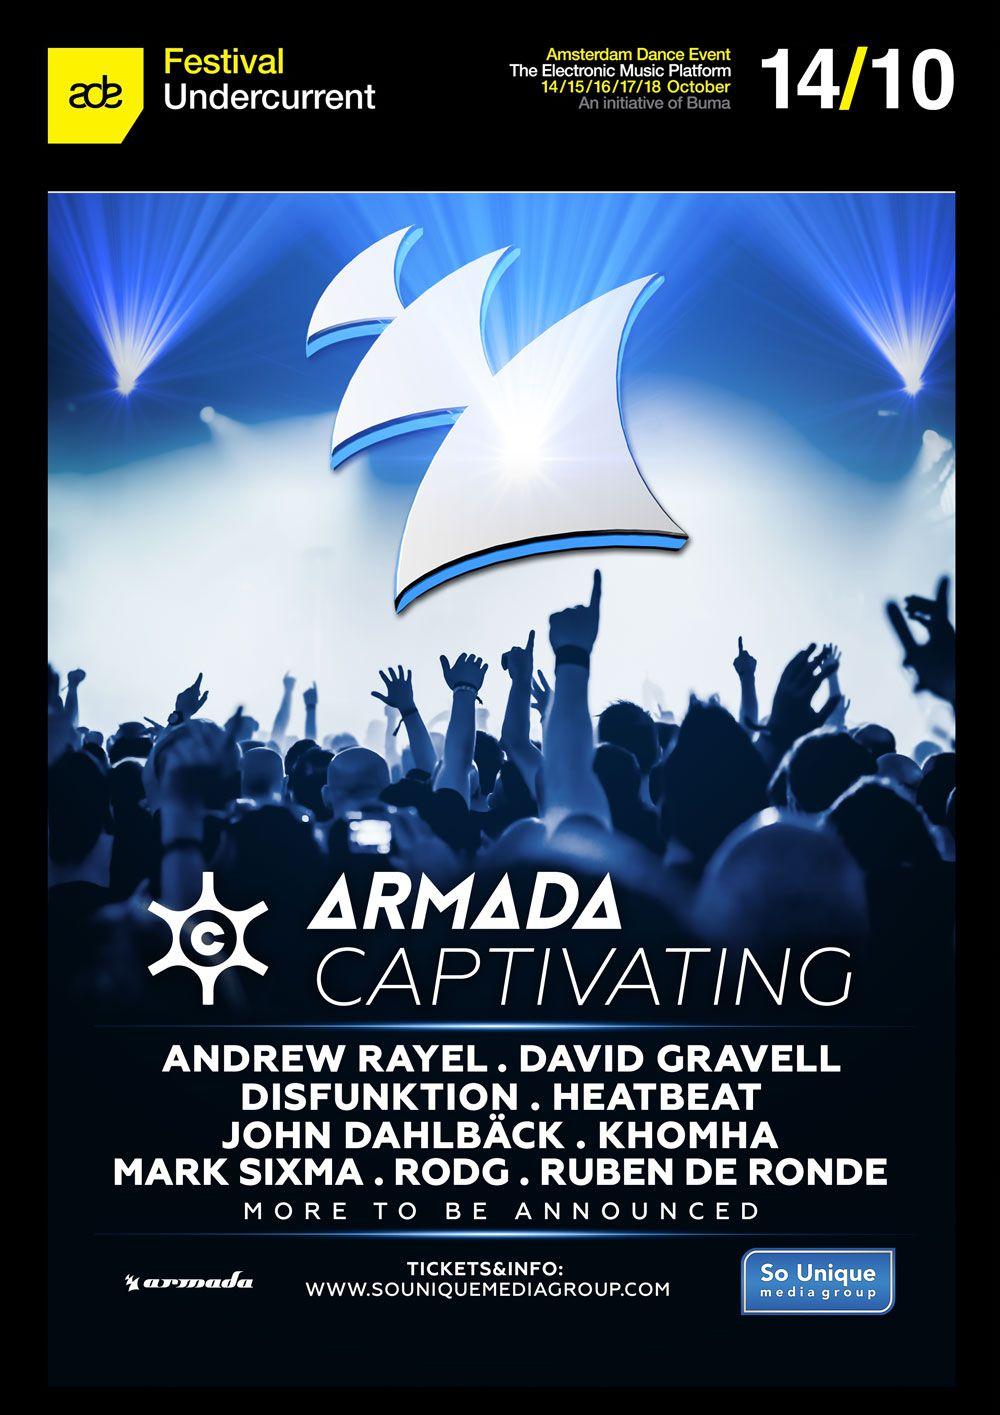 armadacaptivatingade2015.jpg